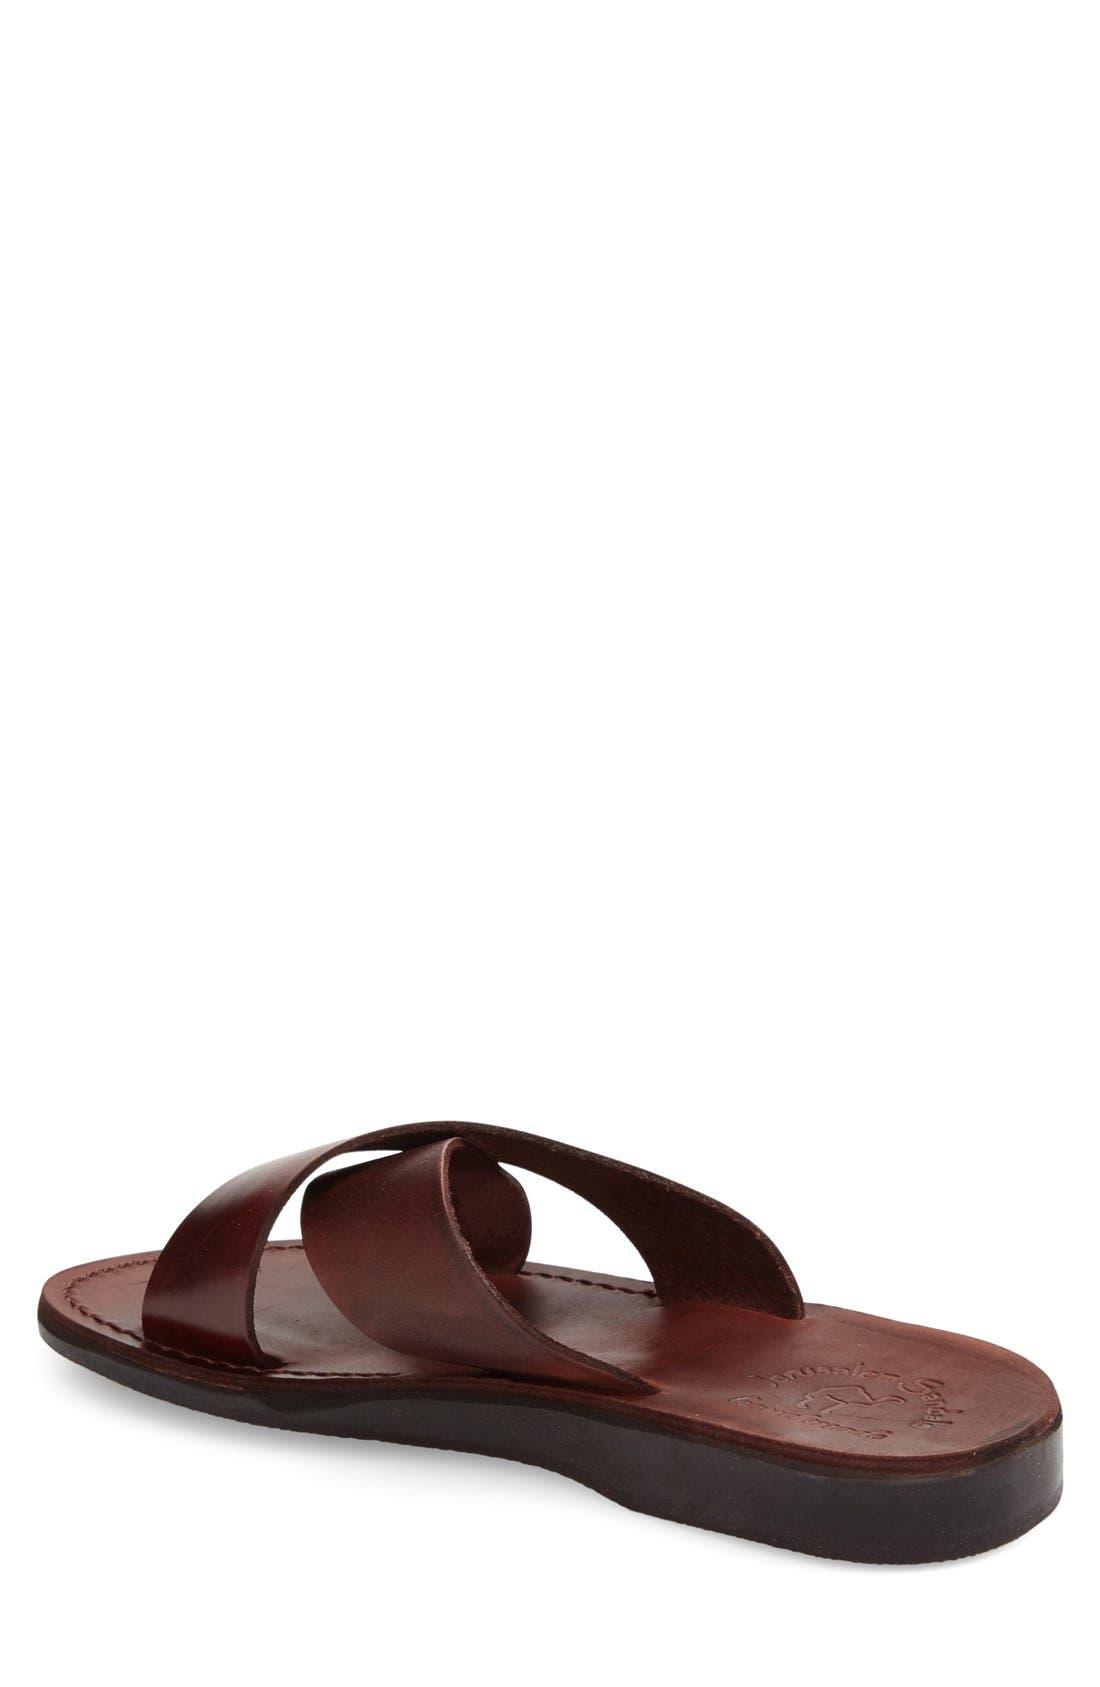 'Elan' Slide Sandal,                             Alternate thumbnail 7, color,                             Brown Leather